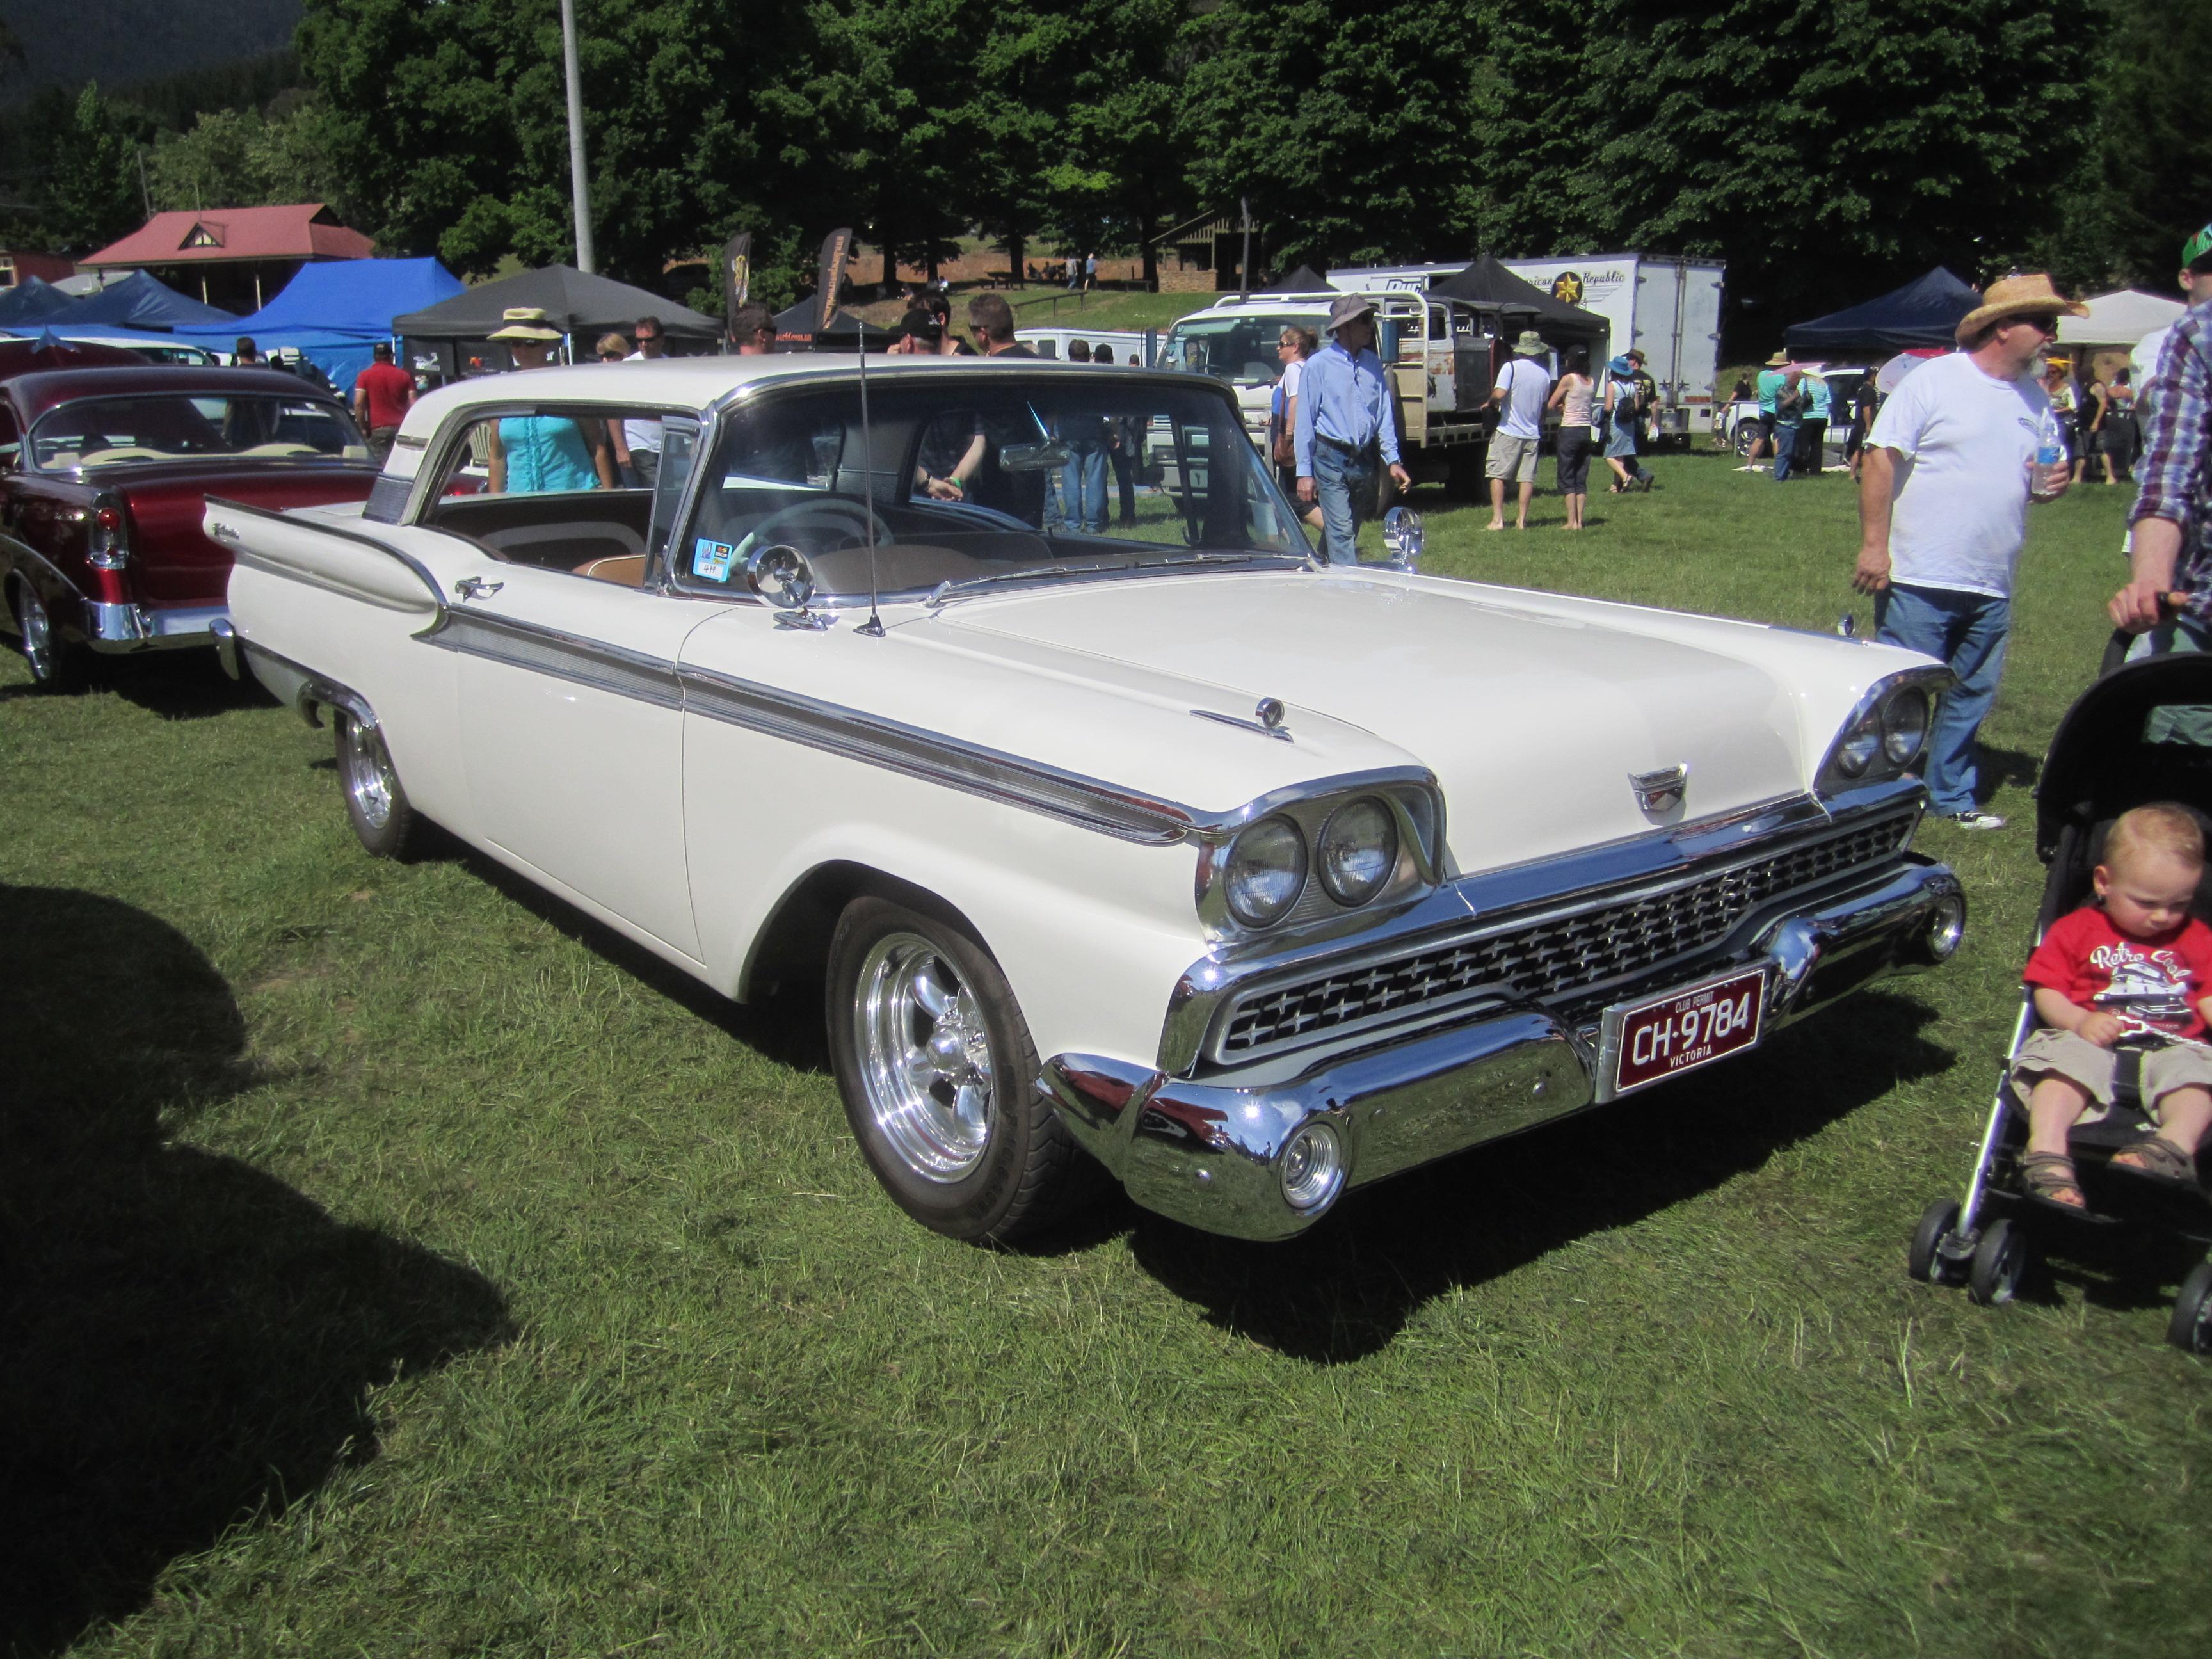 File:1959 Ford Fairlane 2 door Hardtop jpg - Wikimedia Commons